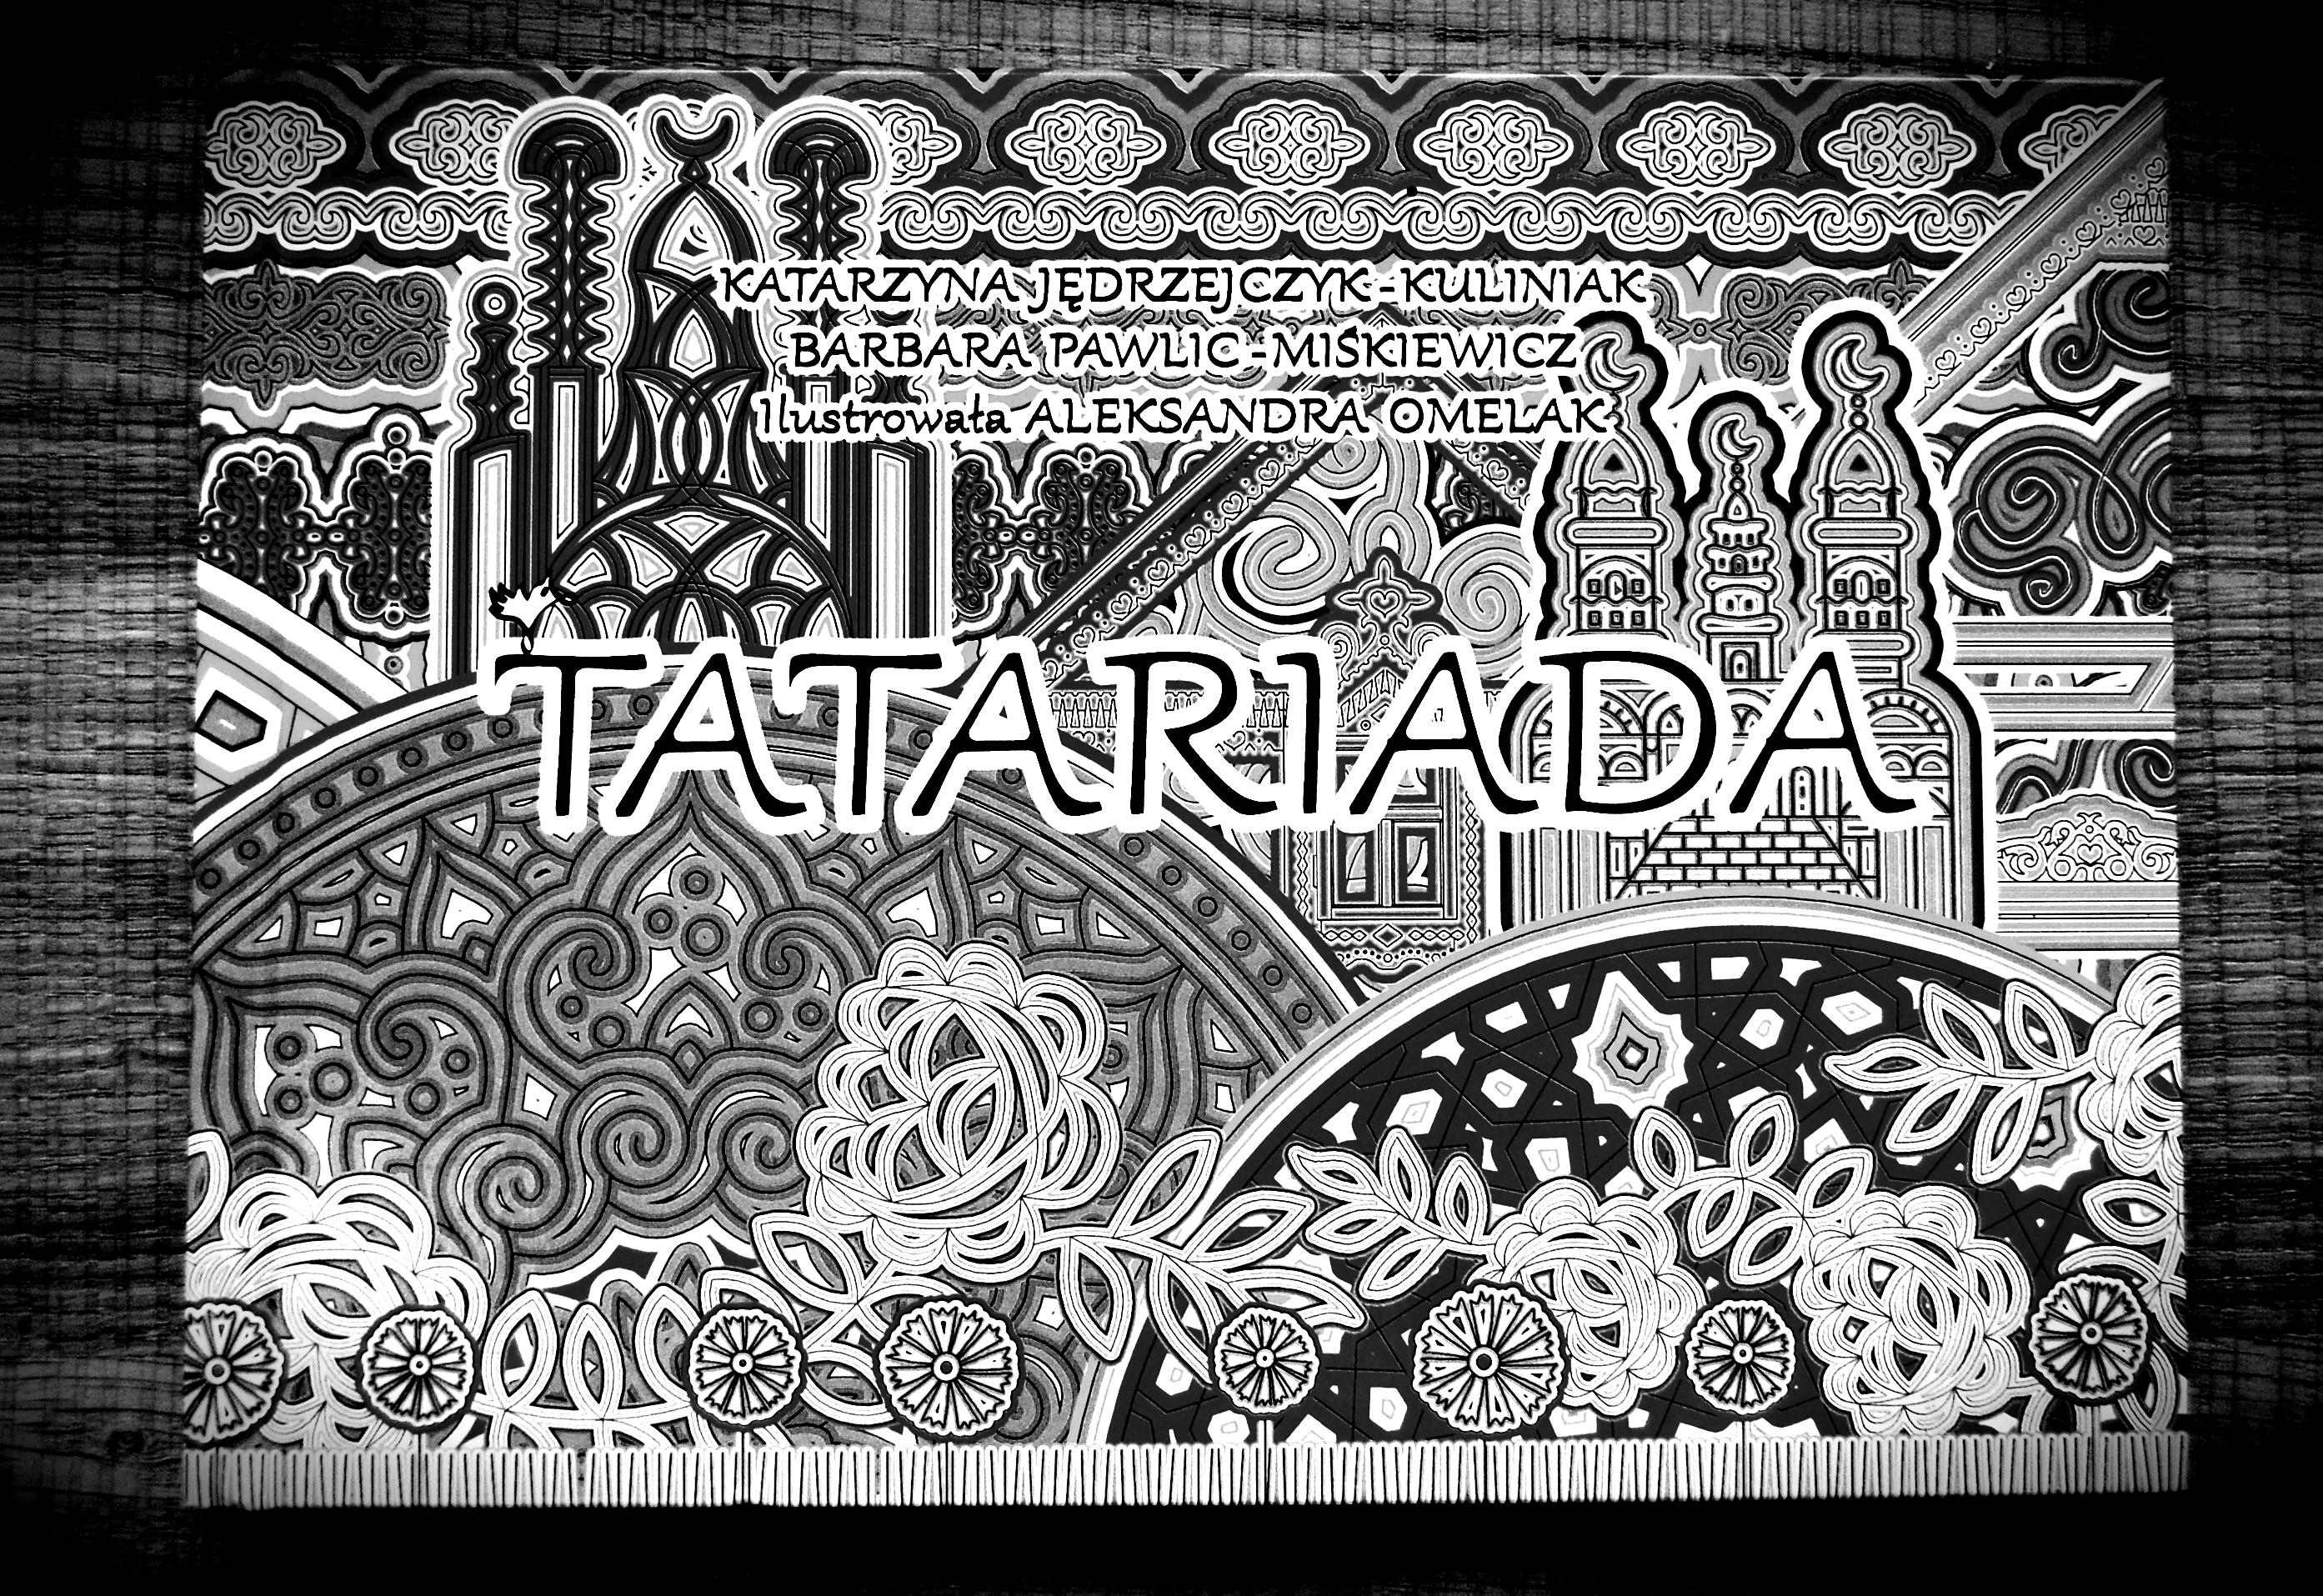 Tatariada_cz.b